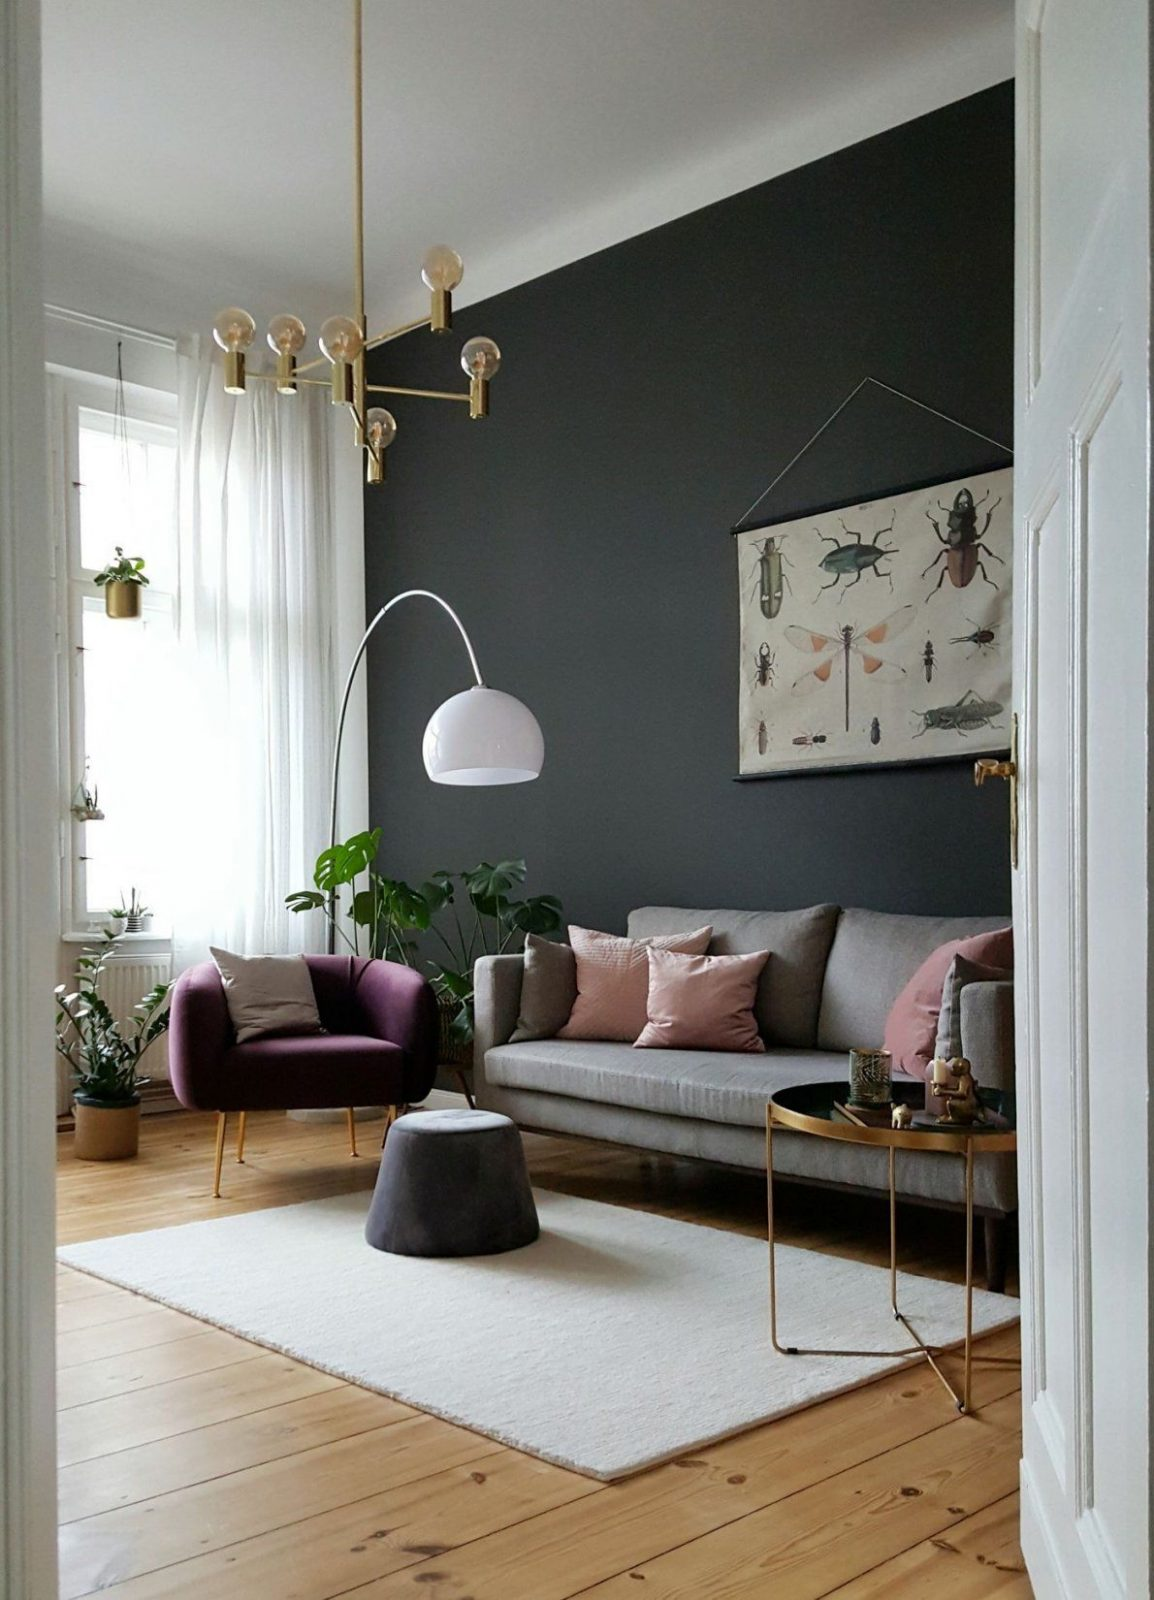 trend graue mbel welche wandfarbe gute inspiration passt zu grauen von welche wandfarbe passt zu. Black Bedroom Furniture Sets. Home Design Ideas